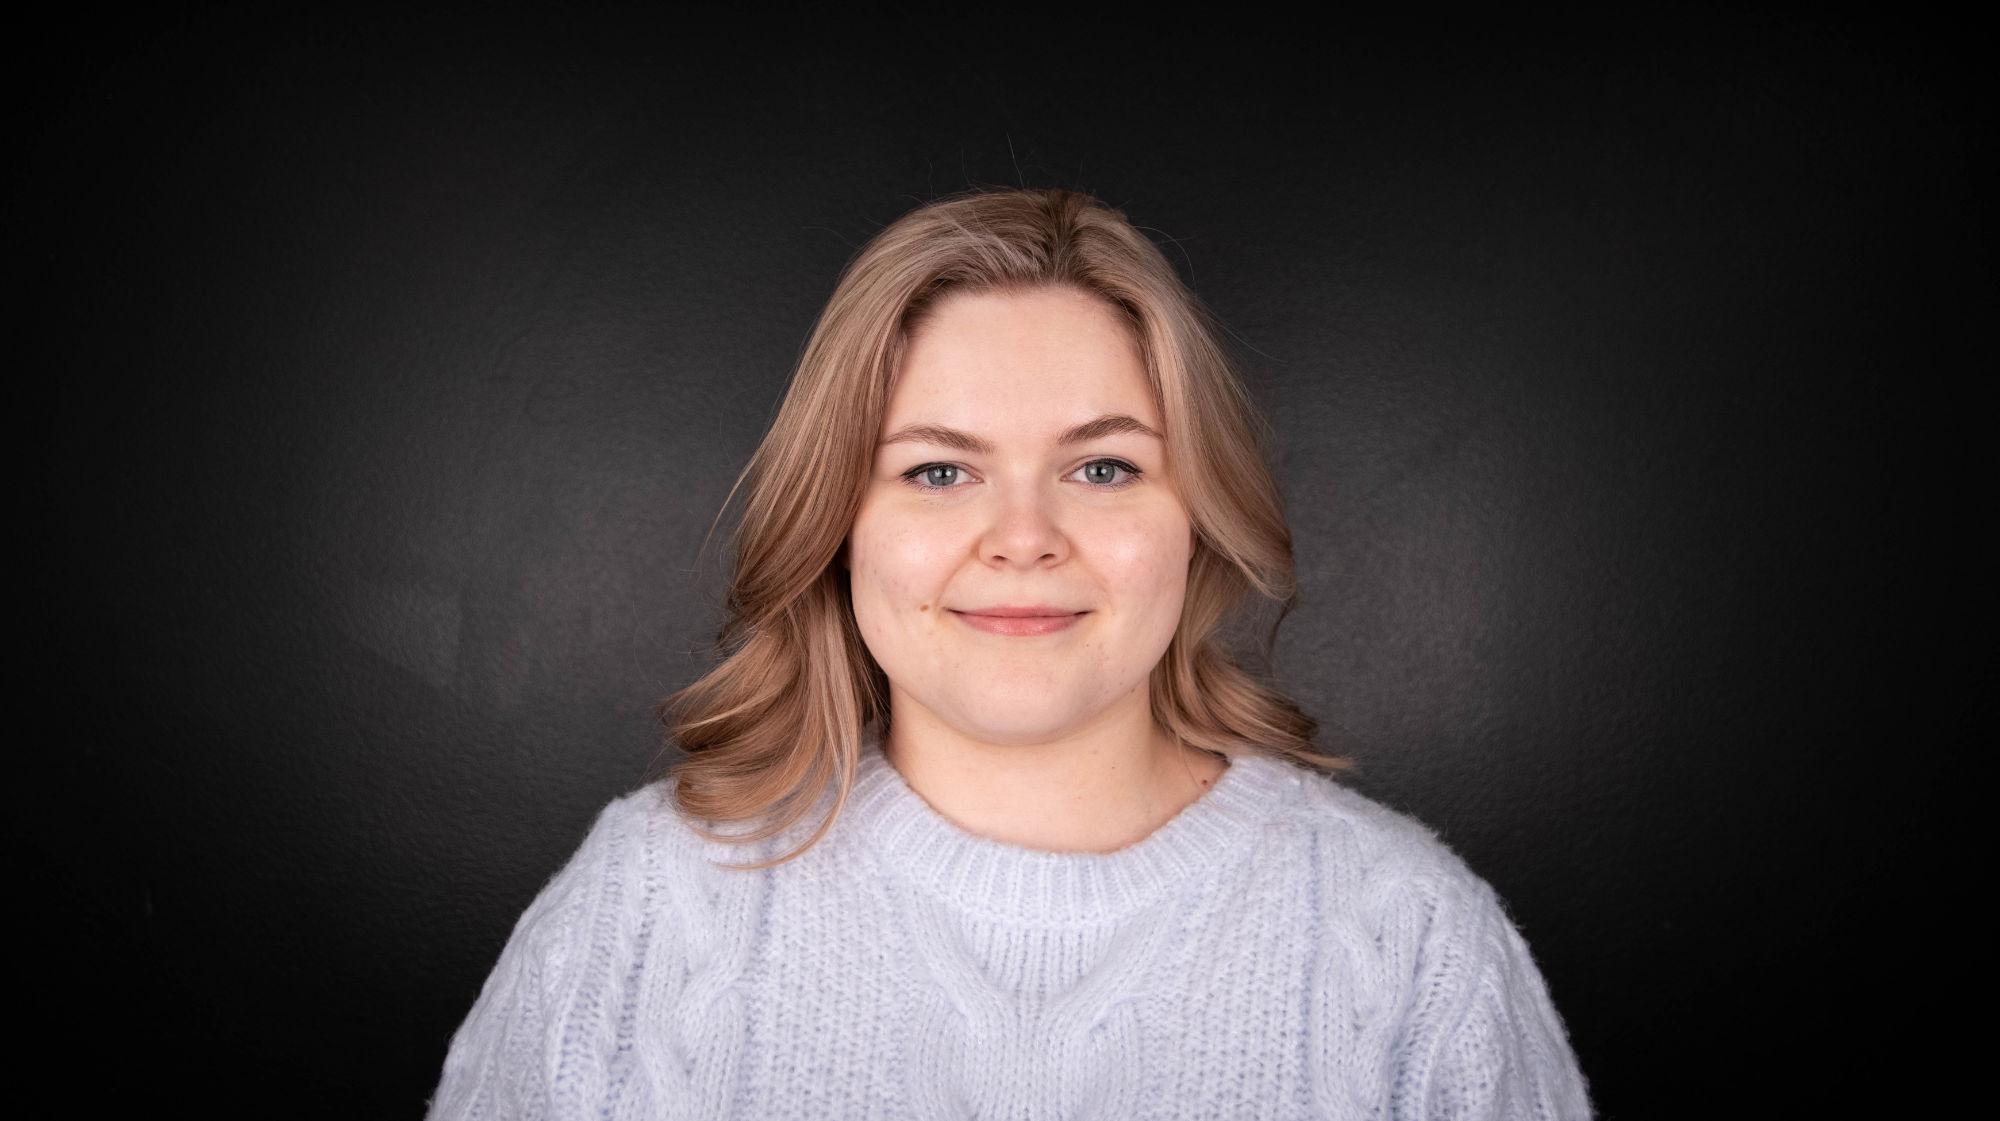 A picture of Kiia Lempinen